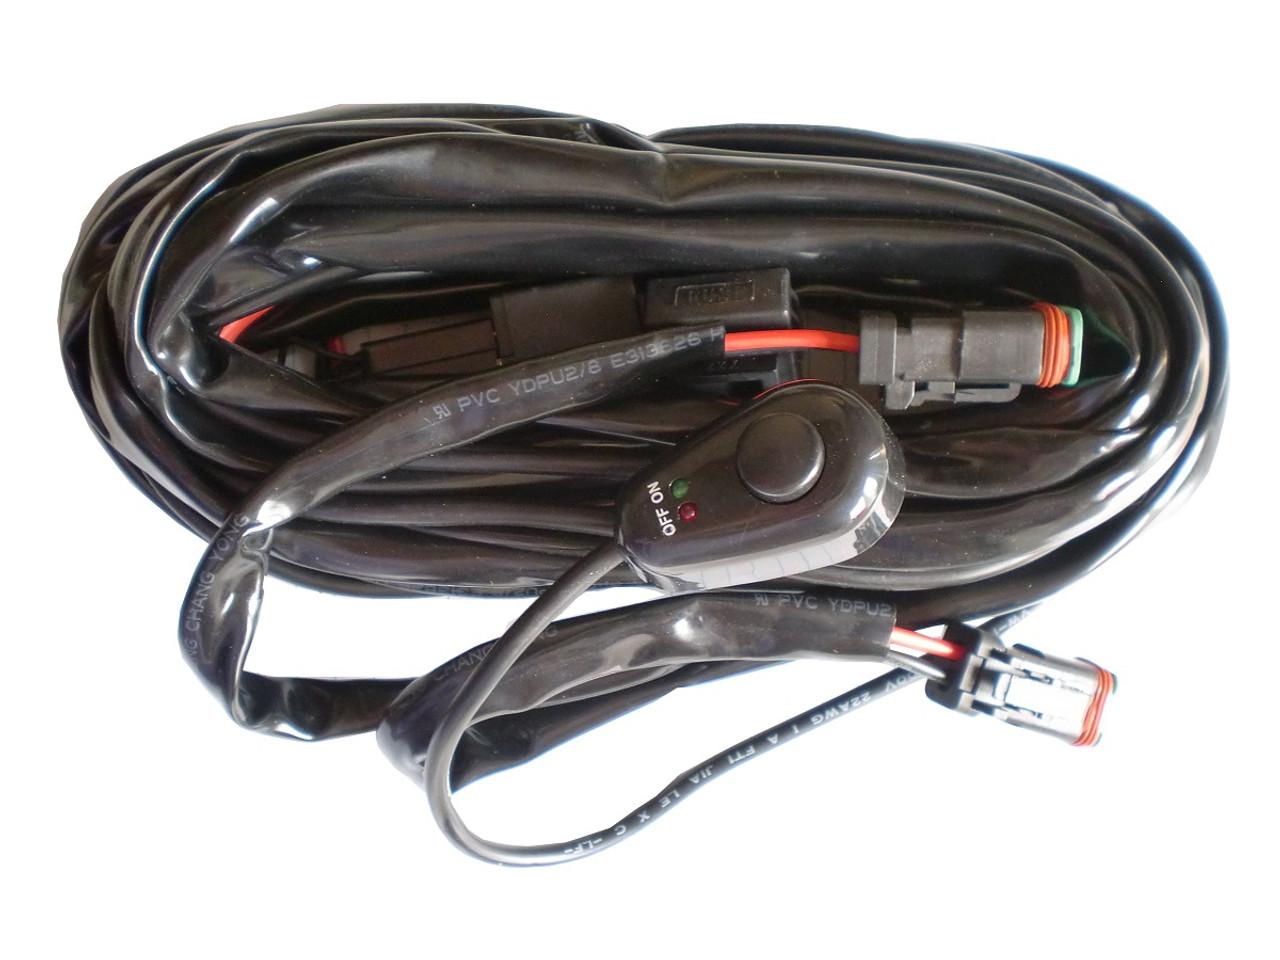 led work light wiring harness [ 1200 x 900 Pixel ]